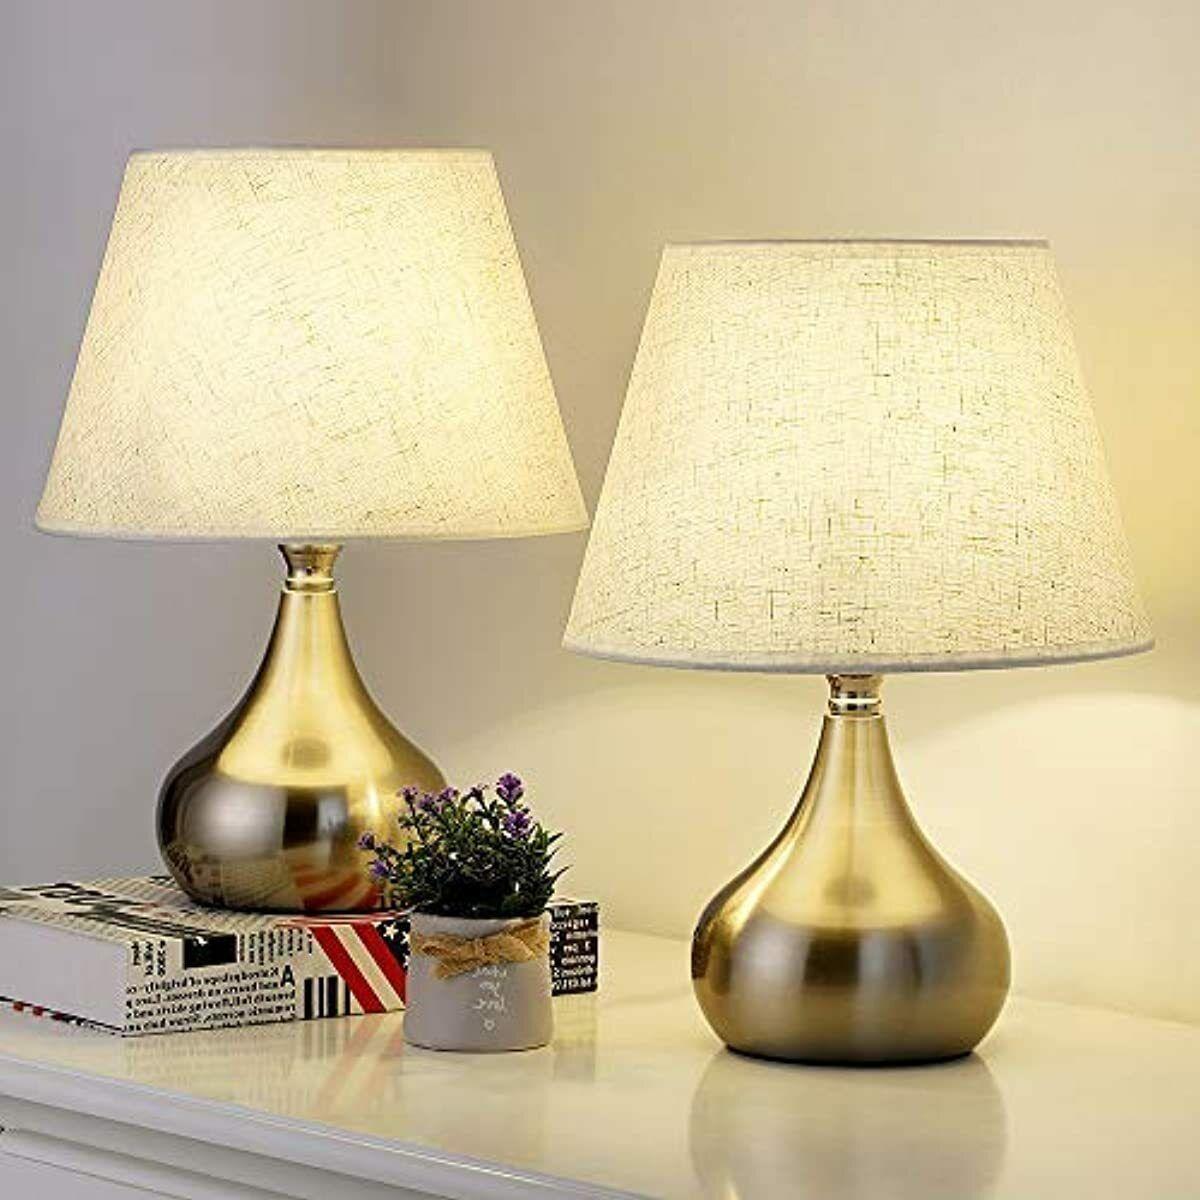 Rzchome Small Bedside Table Lamps Set Of 2 Unique Elegant Bedside Desk Lamps W Ebay